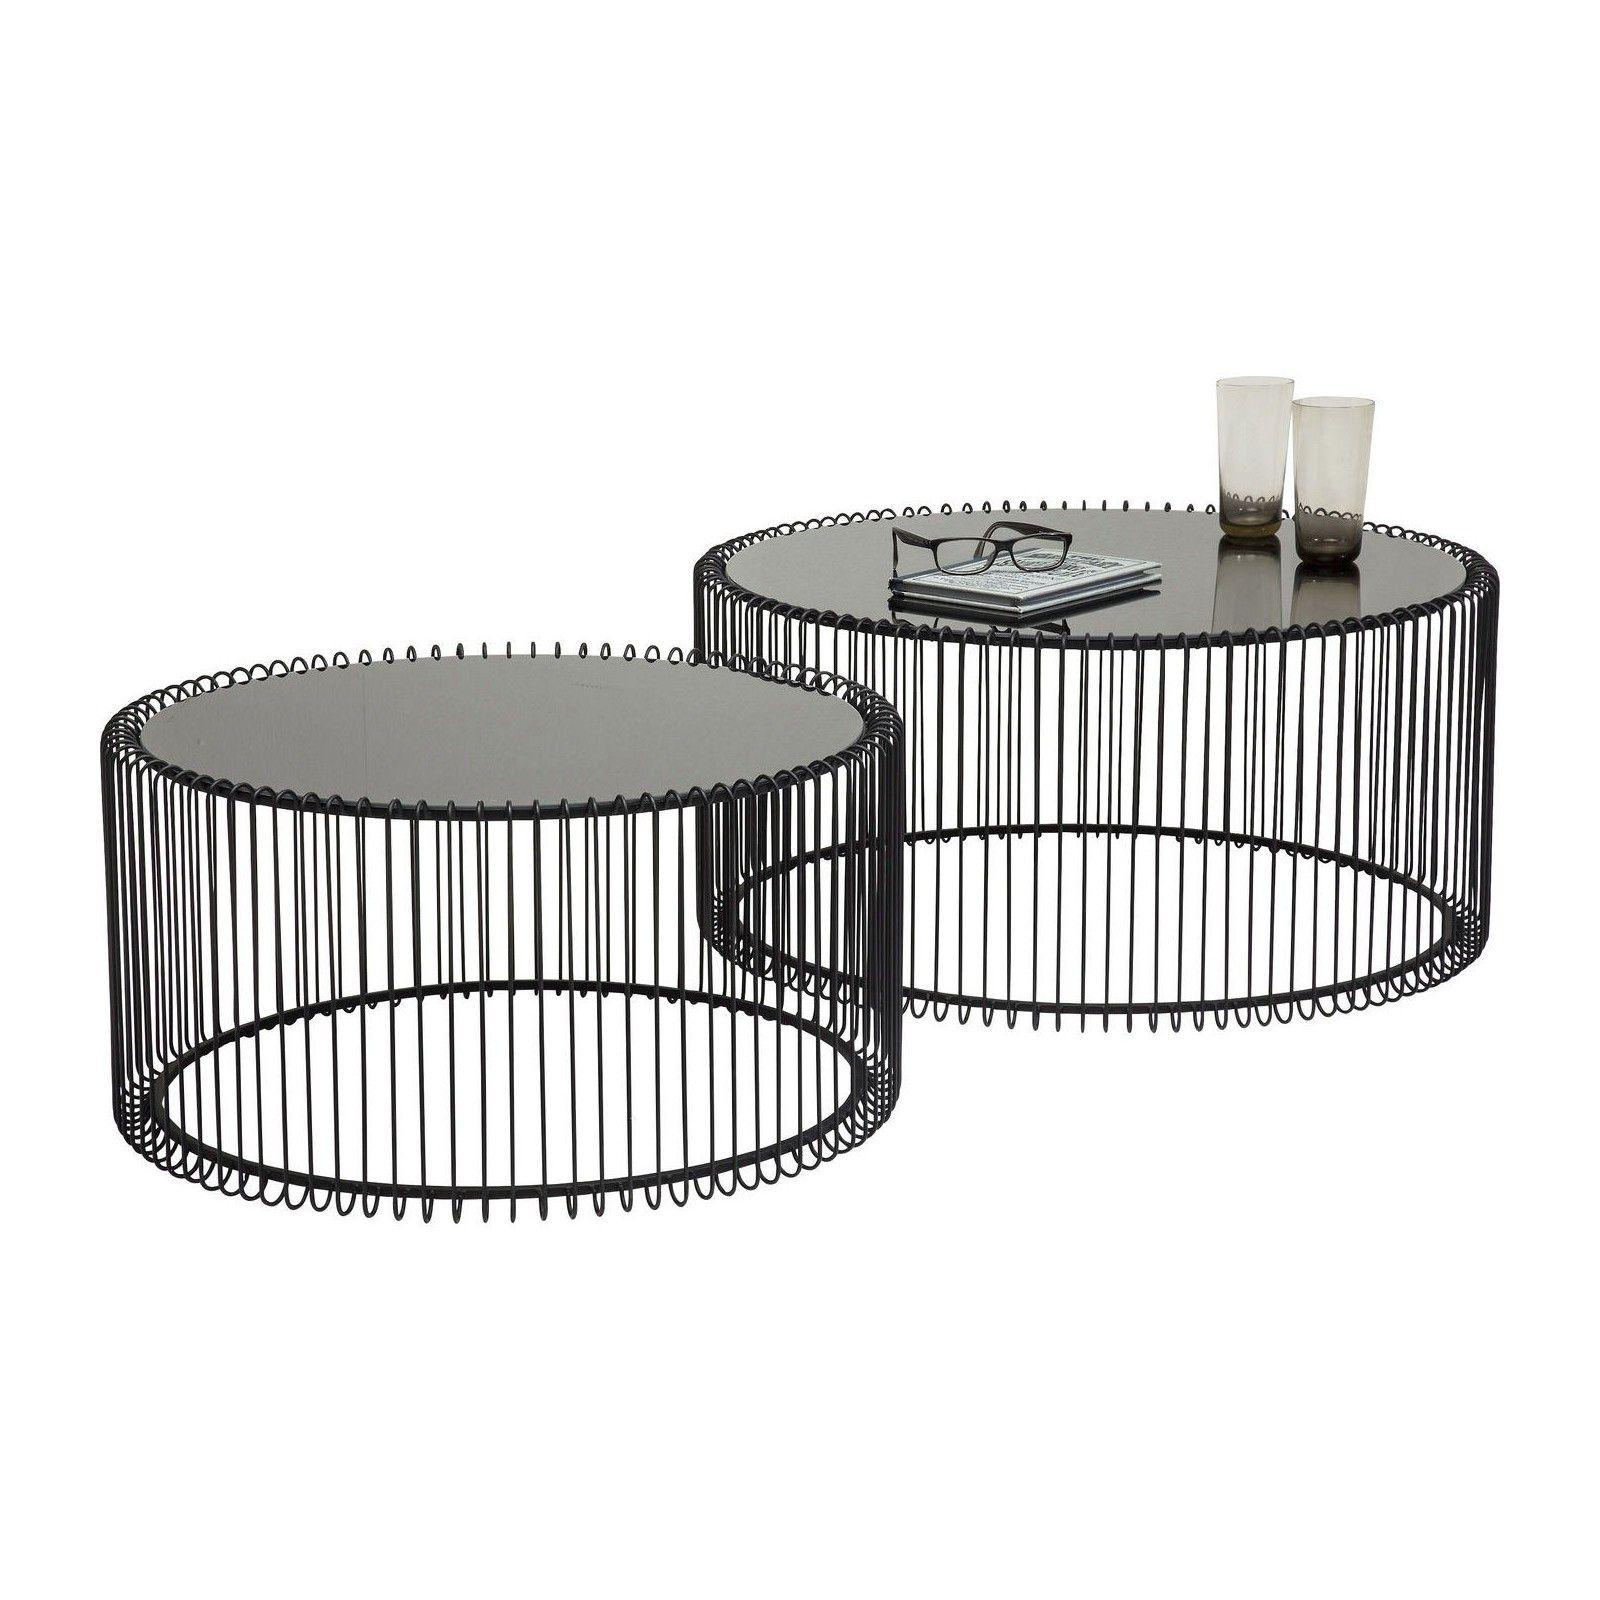 Table Basse Contemporaine Noire Wire Kare Design Table Basse Ronde Table Basse Table Basse Noire